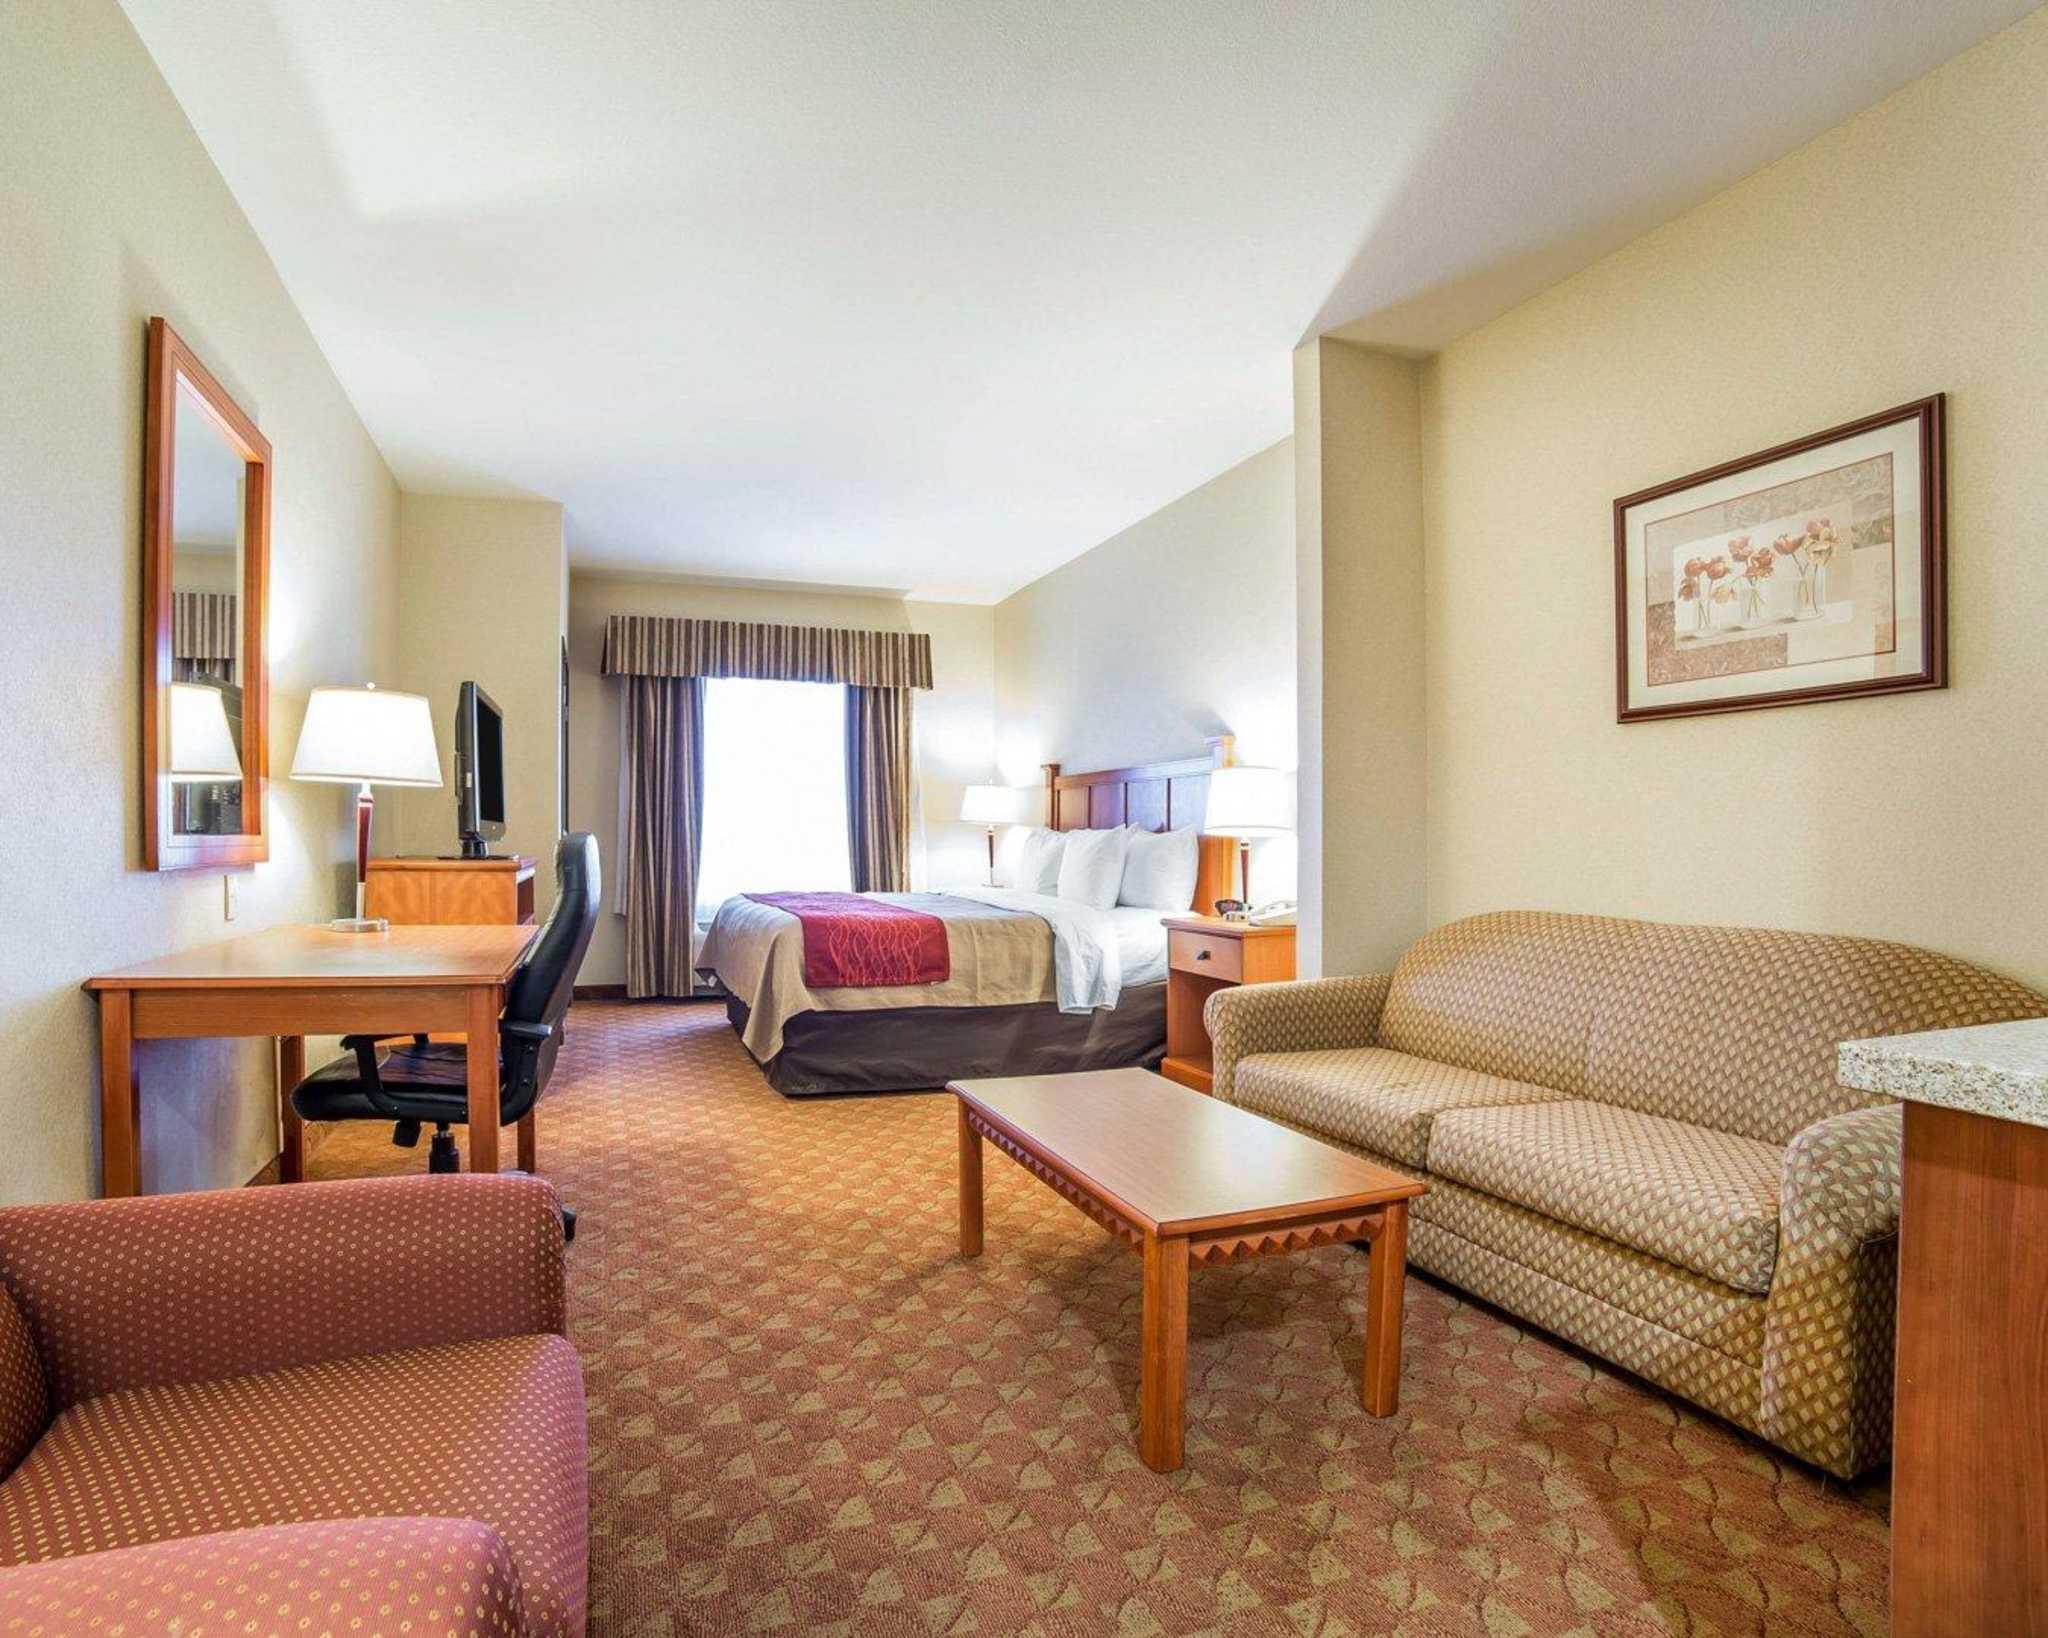 Comfort Inn & Suites Las Vegas - Nellis image 17